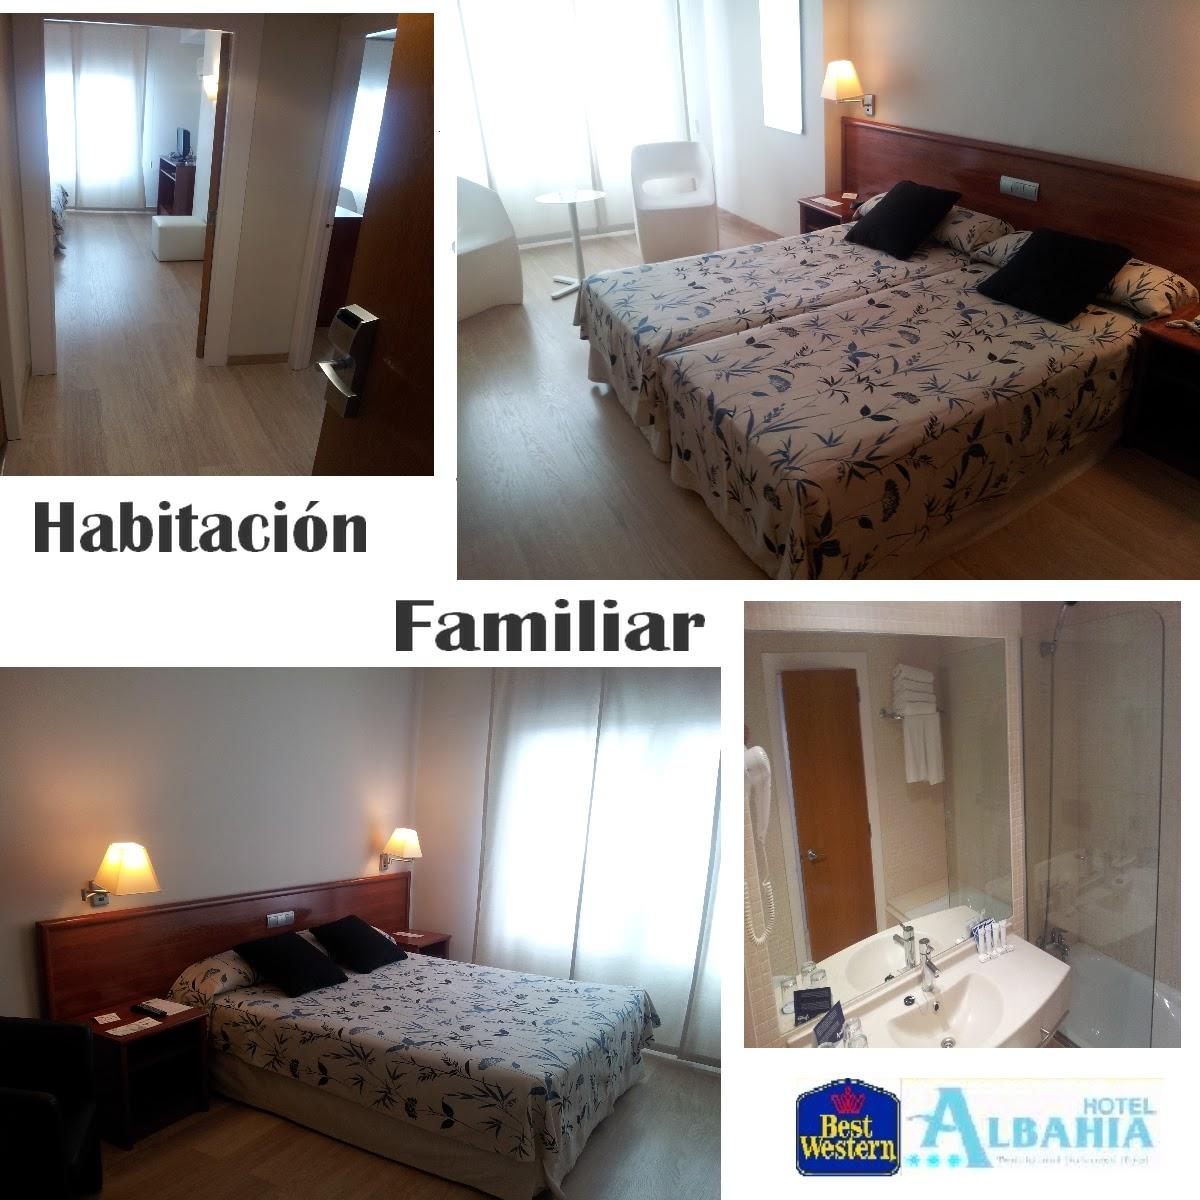 Best western hotel albahia alicante habitaci n familiar for Hotel habitacion familiar ibiza